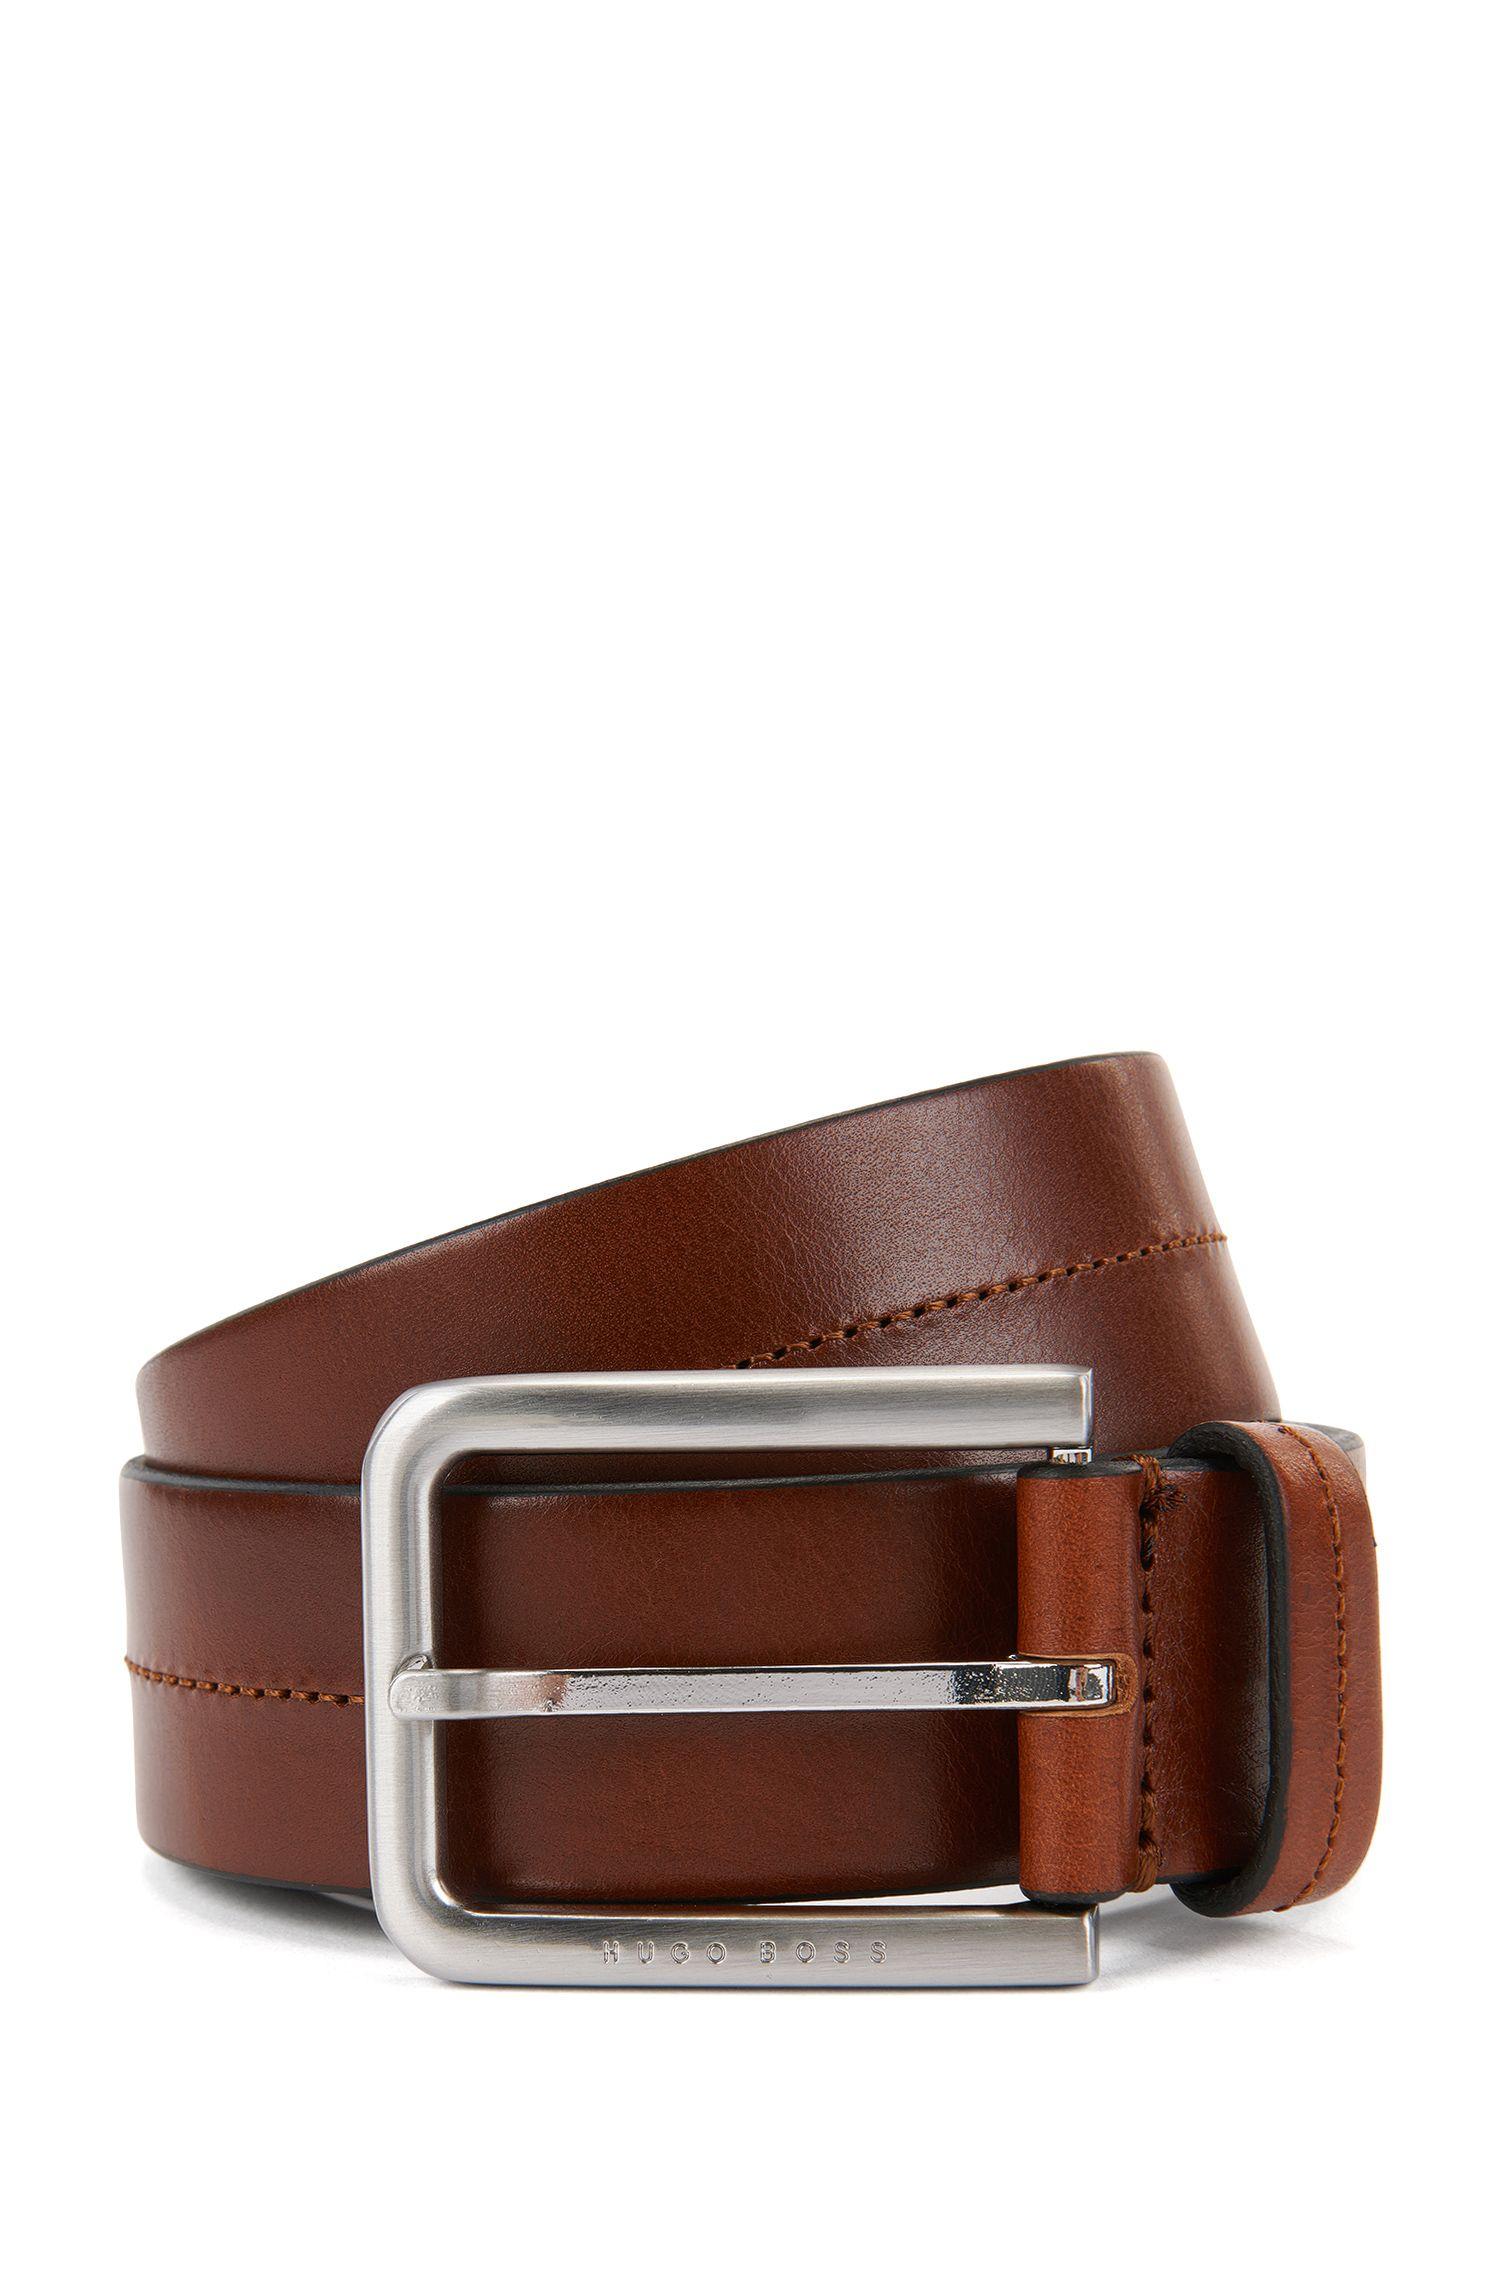 Leather belt with tonal stitching